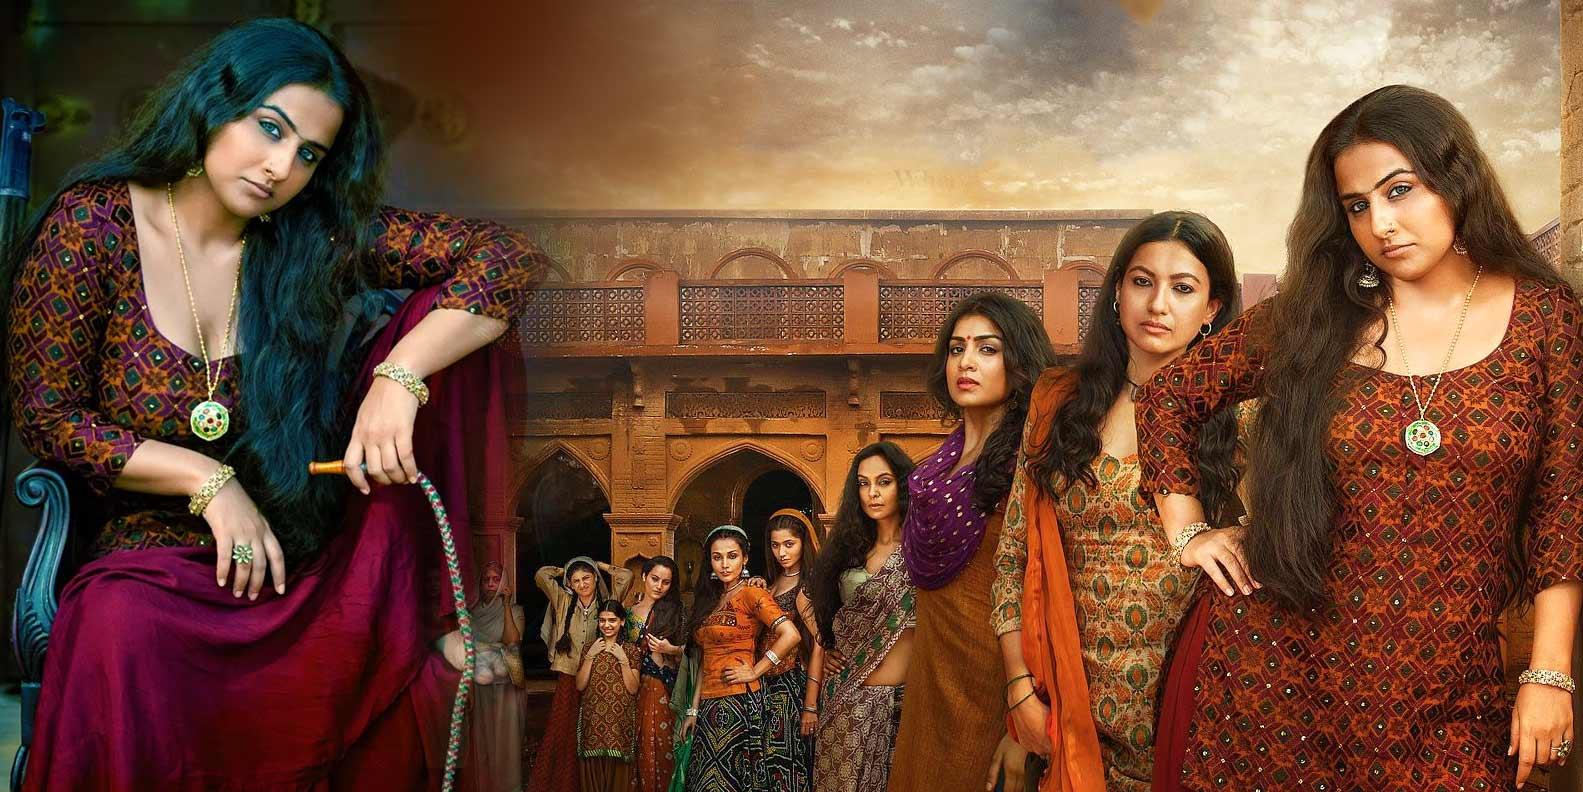 Begum Jaan - Header Image